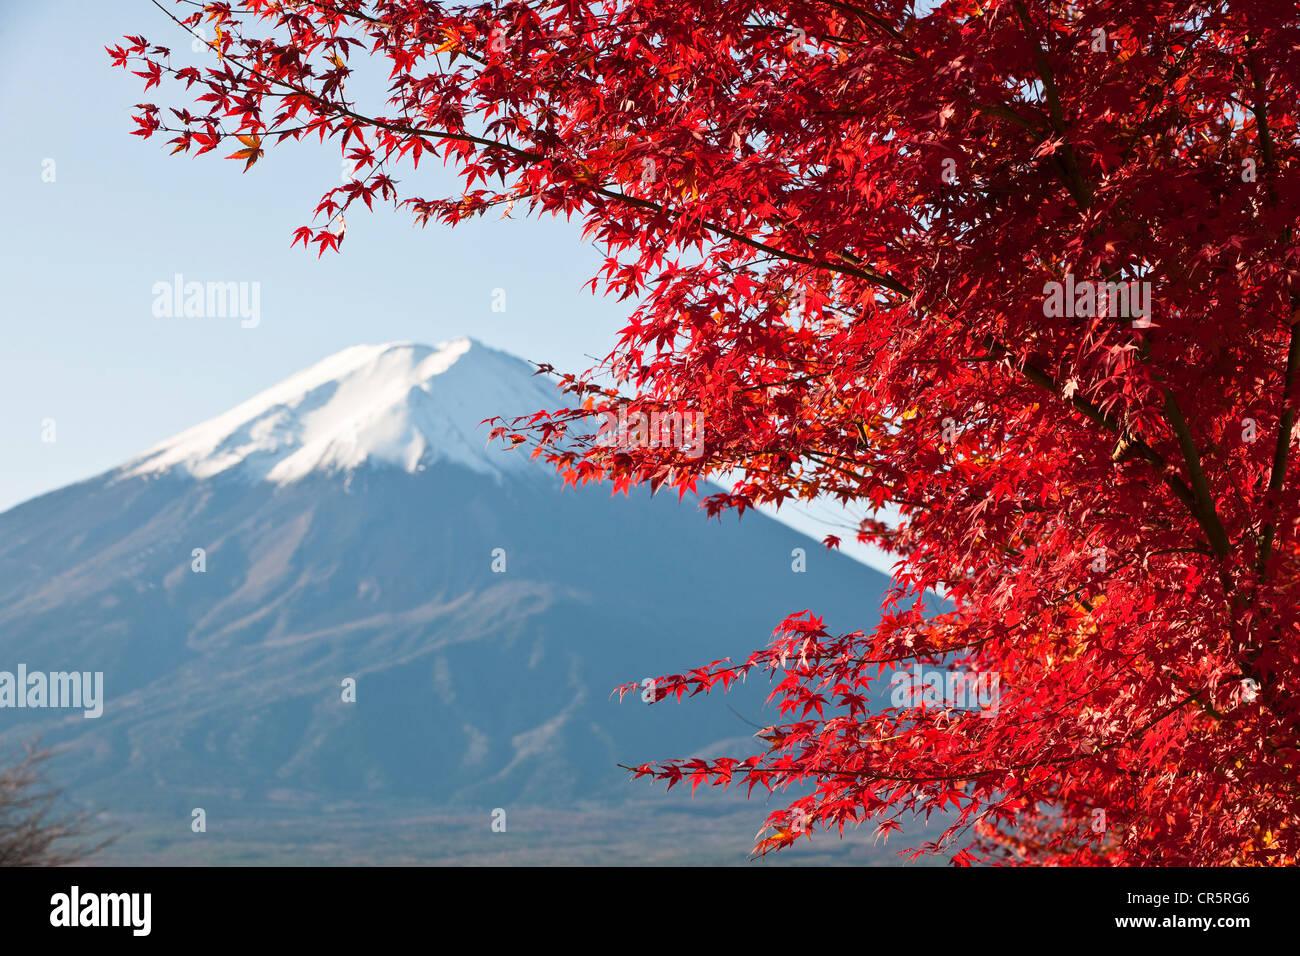 Japan, Honshu Island, Kansai Region, the Mount Fuji (3776m) seen from the shores of the lake Kawaguchiko - Stock Image